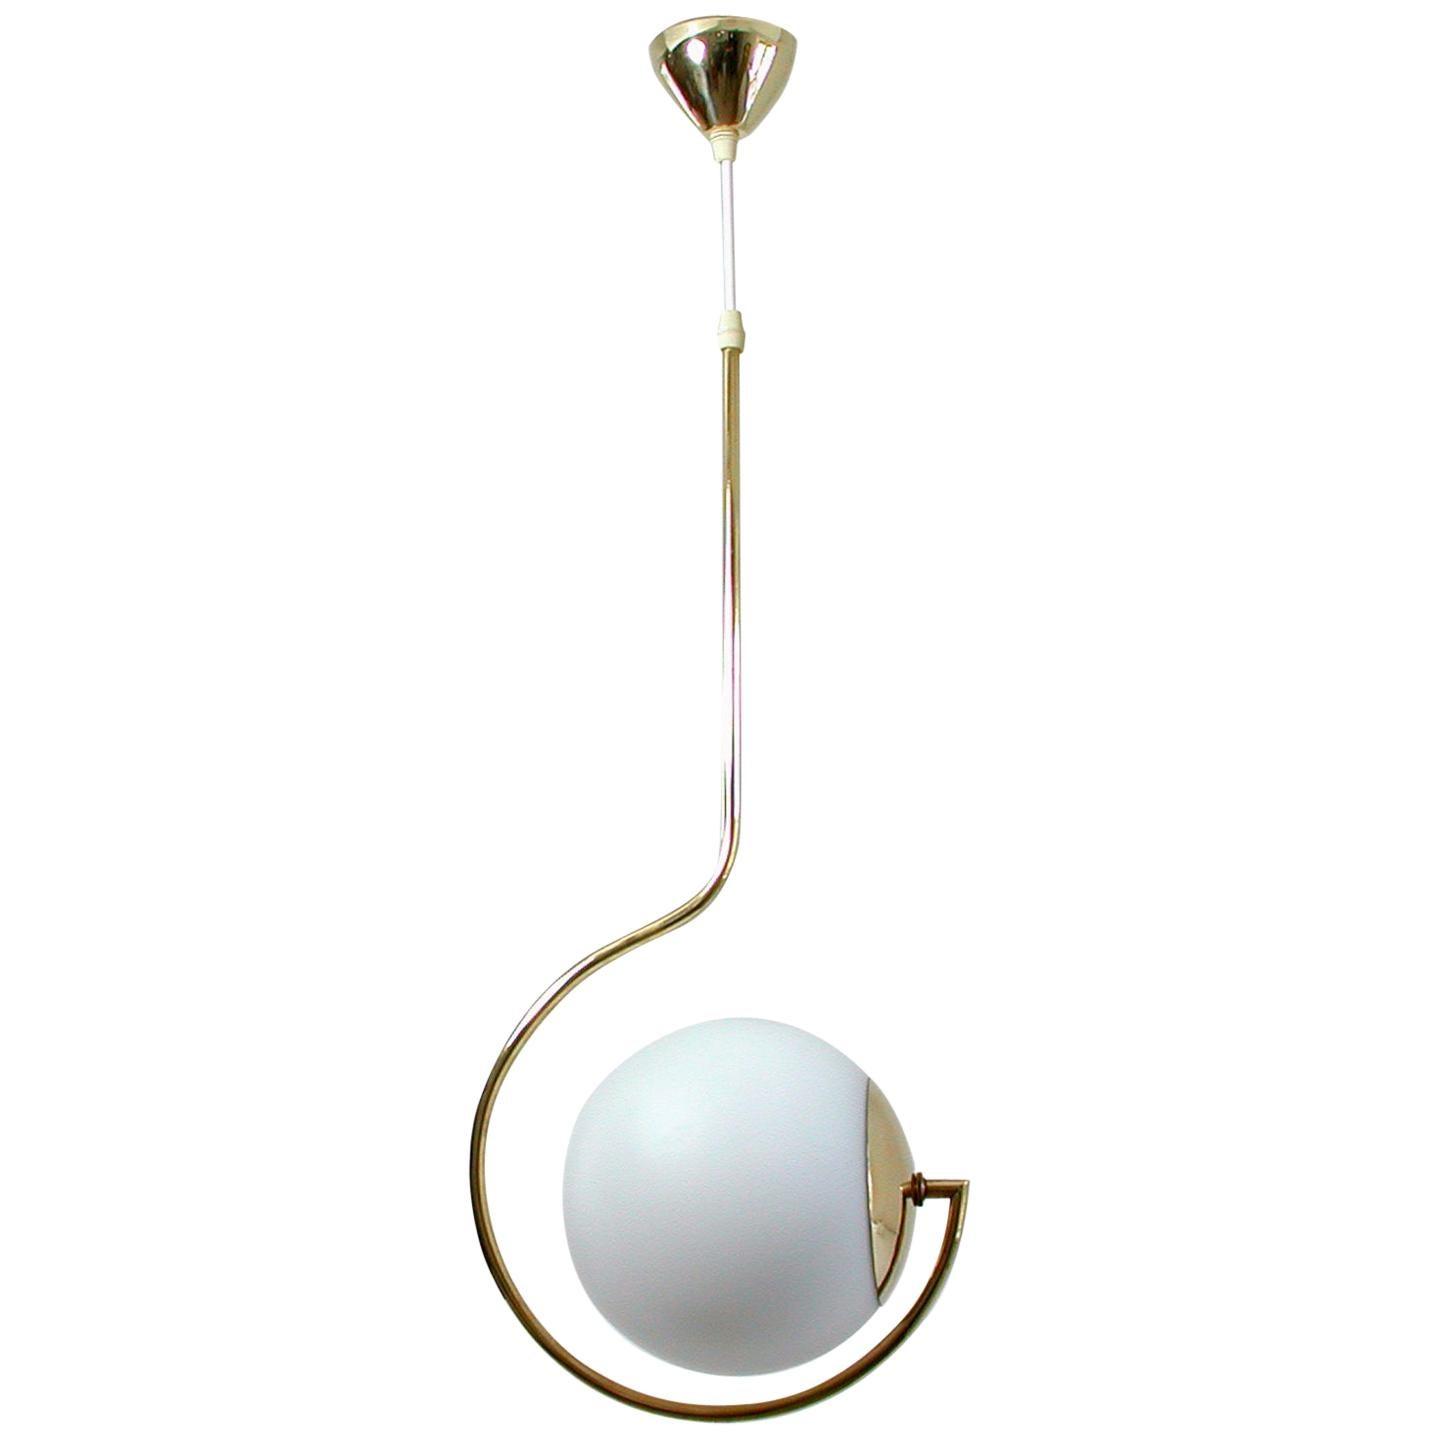 Mid-Century Modern Italian Satinated Glass and Brass Pendant Chandelier, 1950s